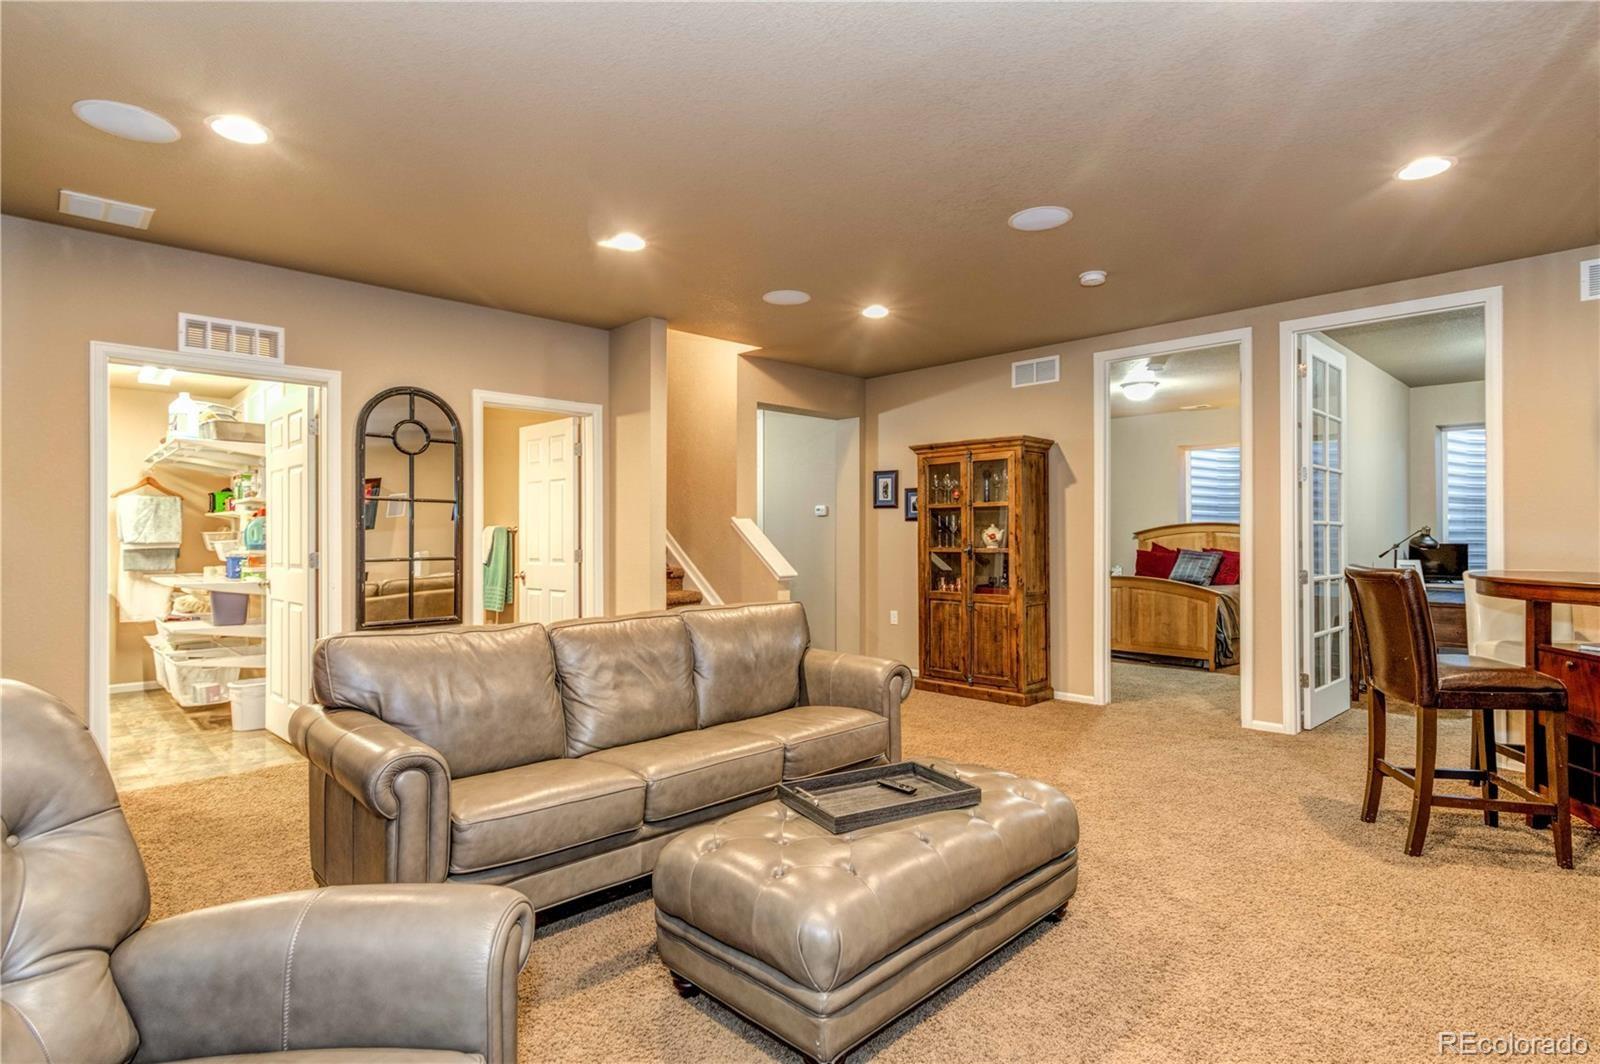 MLS# 4961371 - 23 - 7487 Mountain Spruce , Colorado Springs, CO 80927